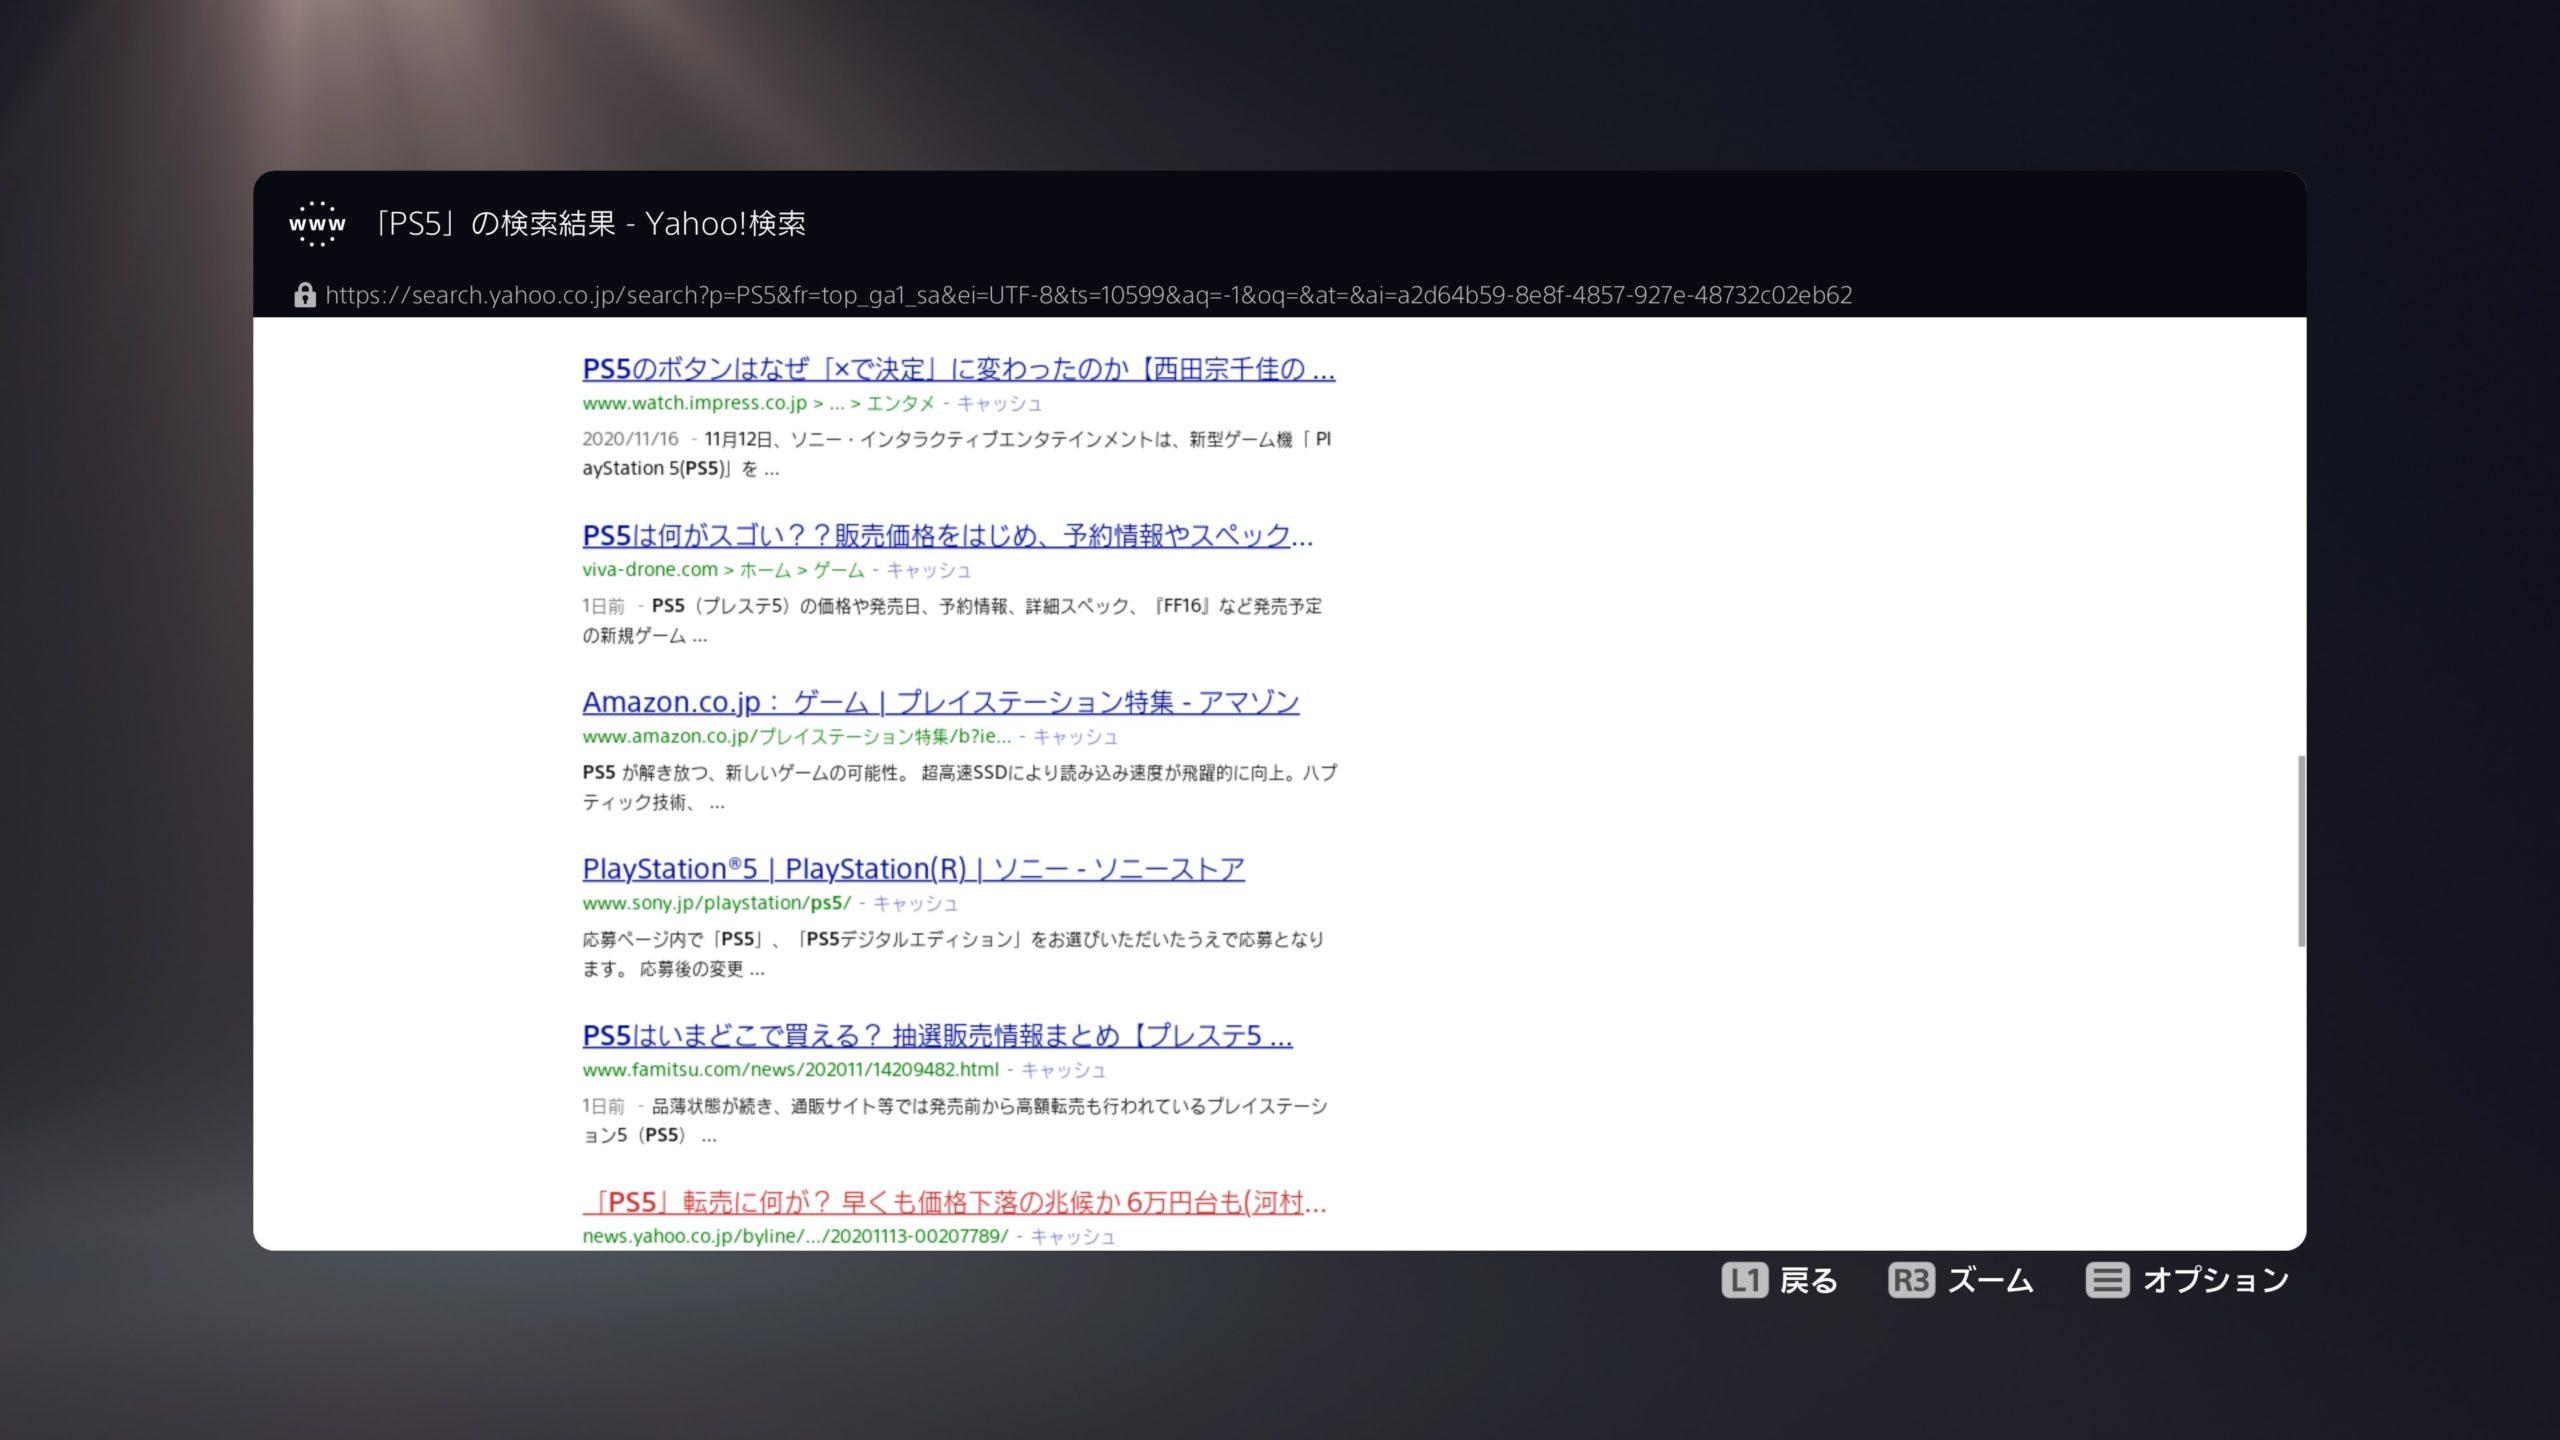 PS5 Yahoo! で検索も可能